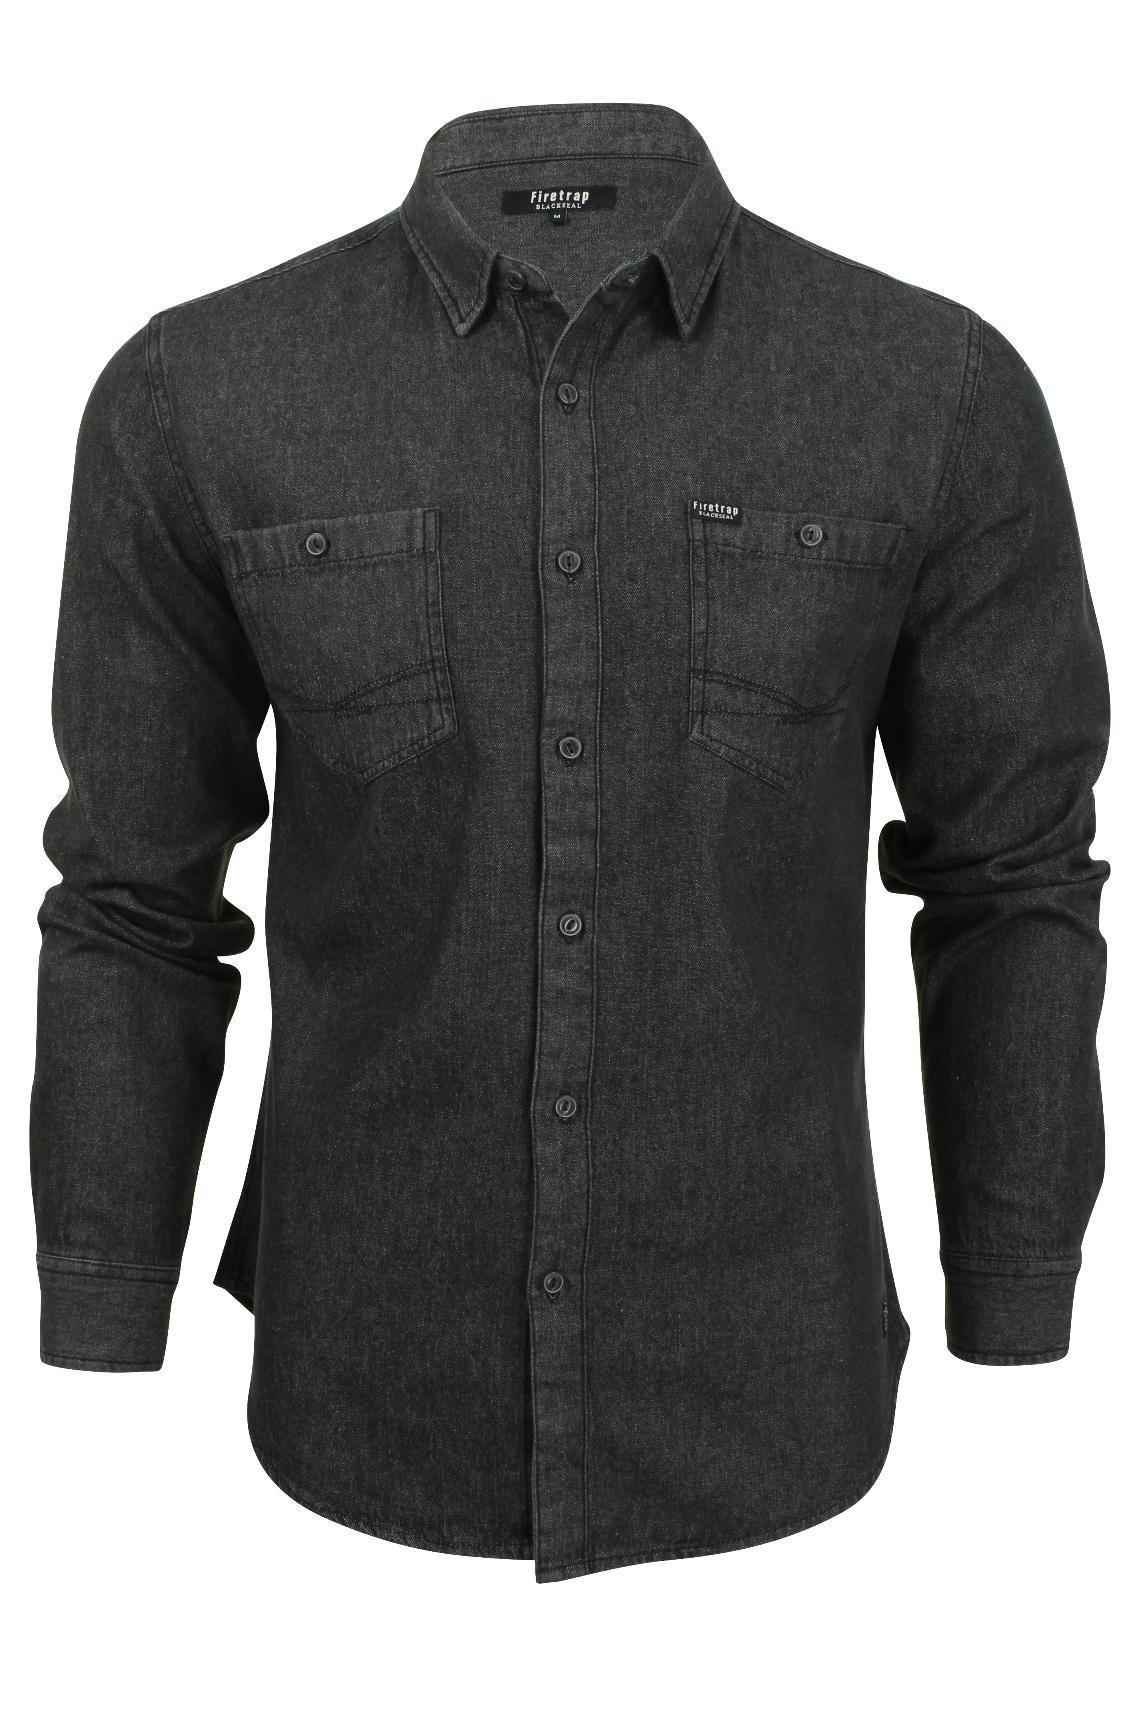 Mens Denim Shirt Firetrap 'Garrick' Western Vintage Wash ...